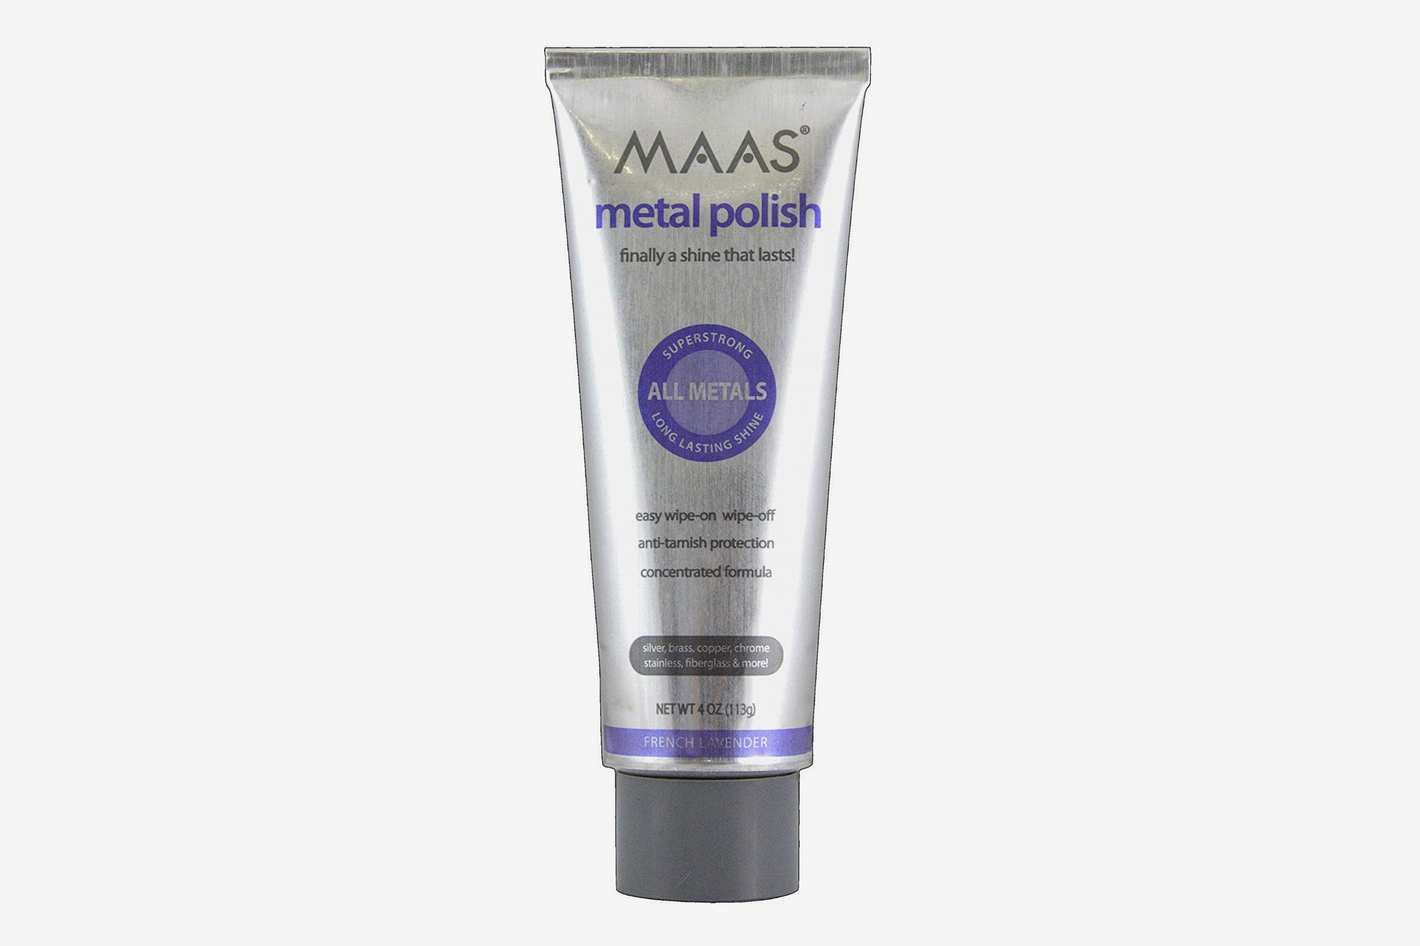 Maas Metal Polish